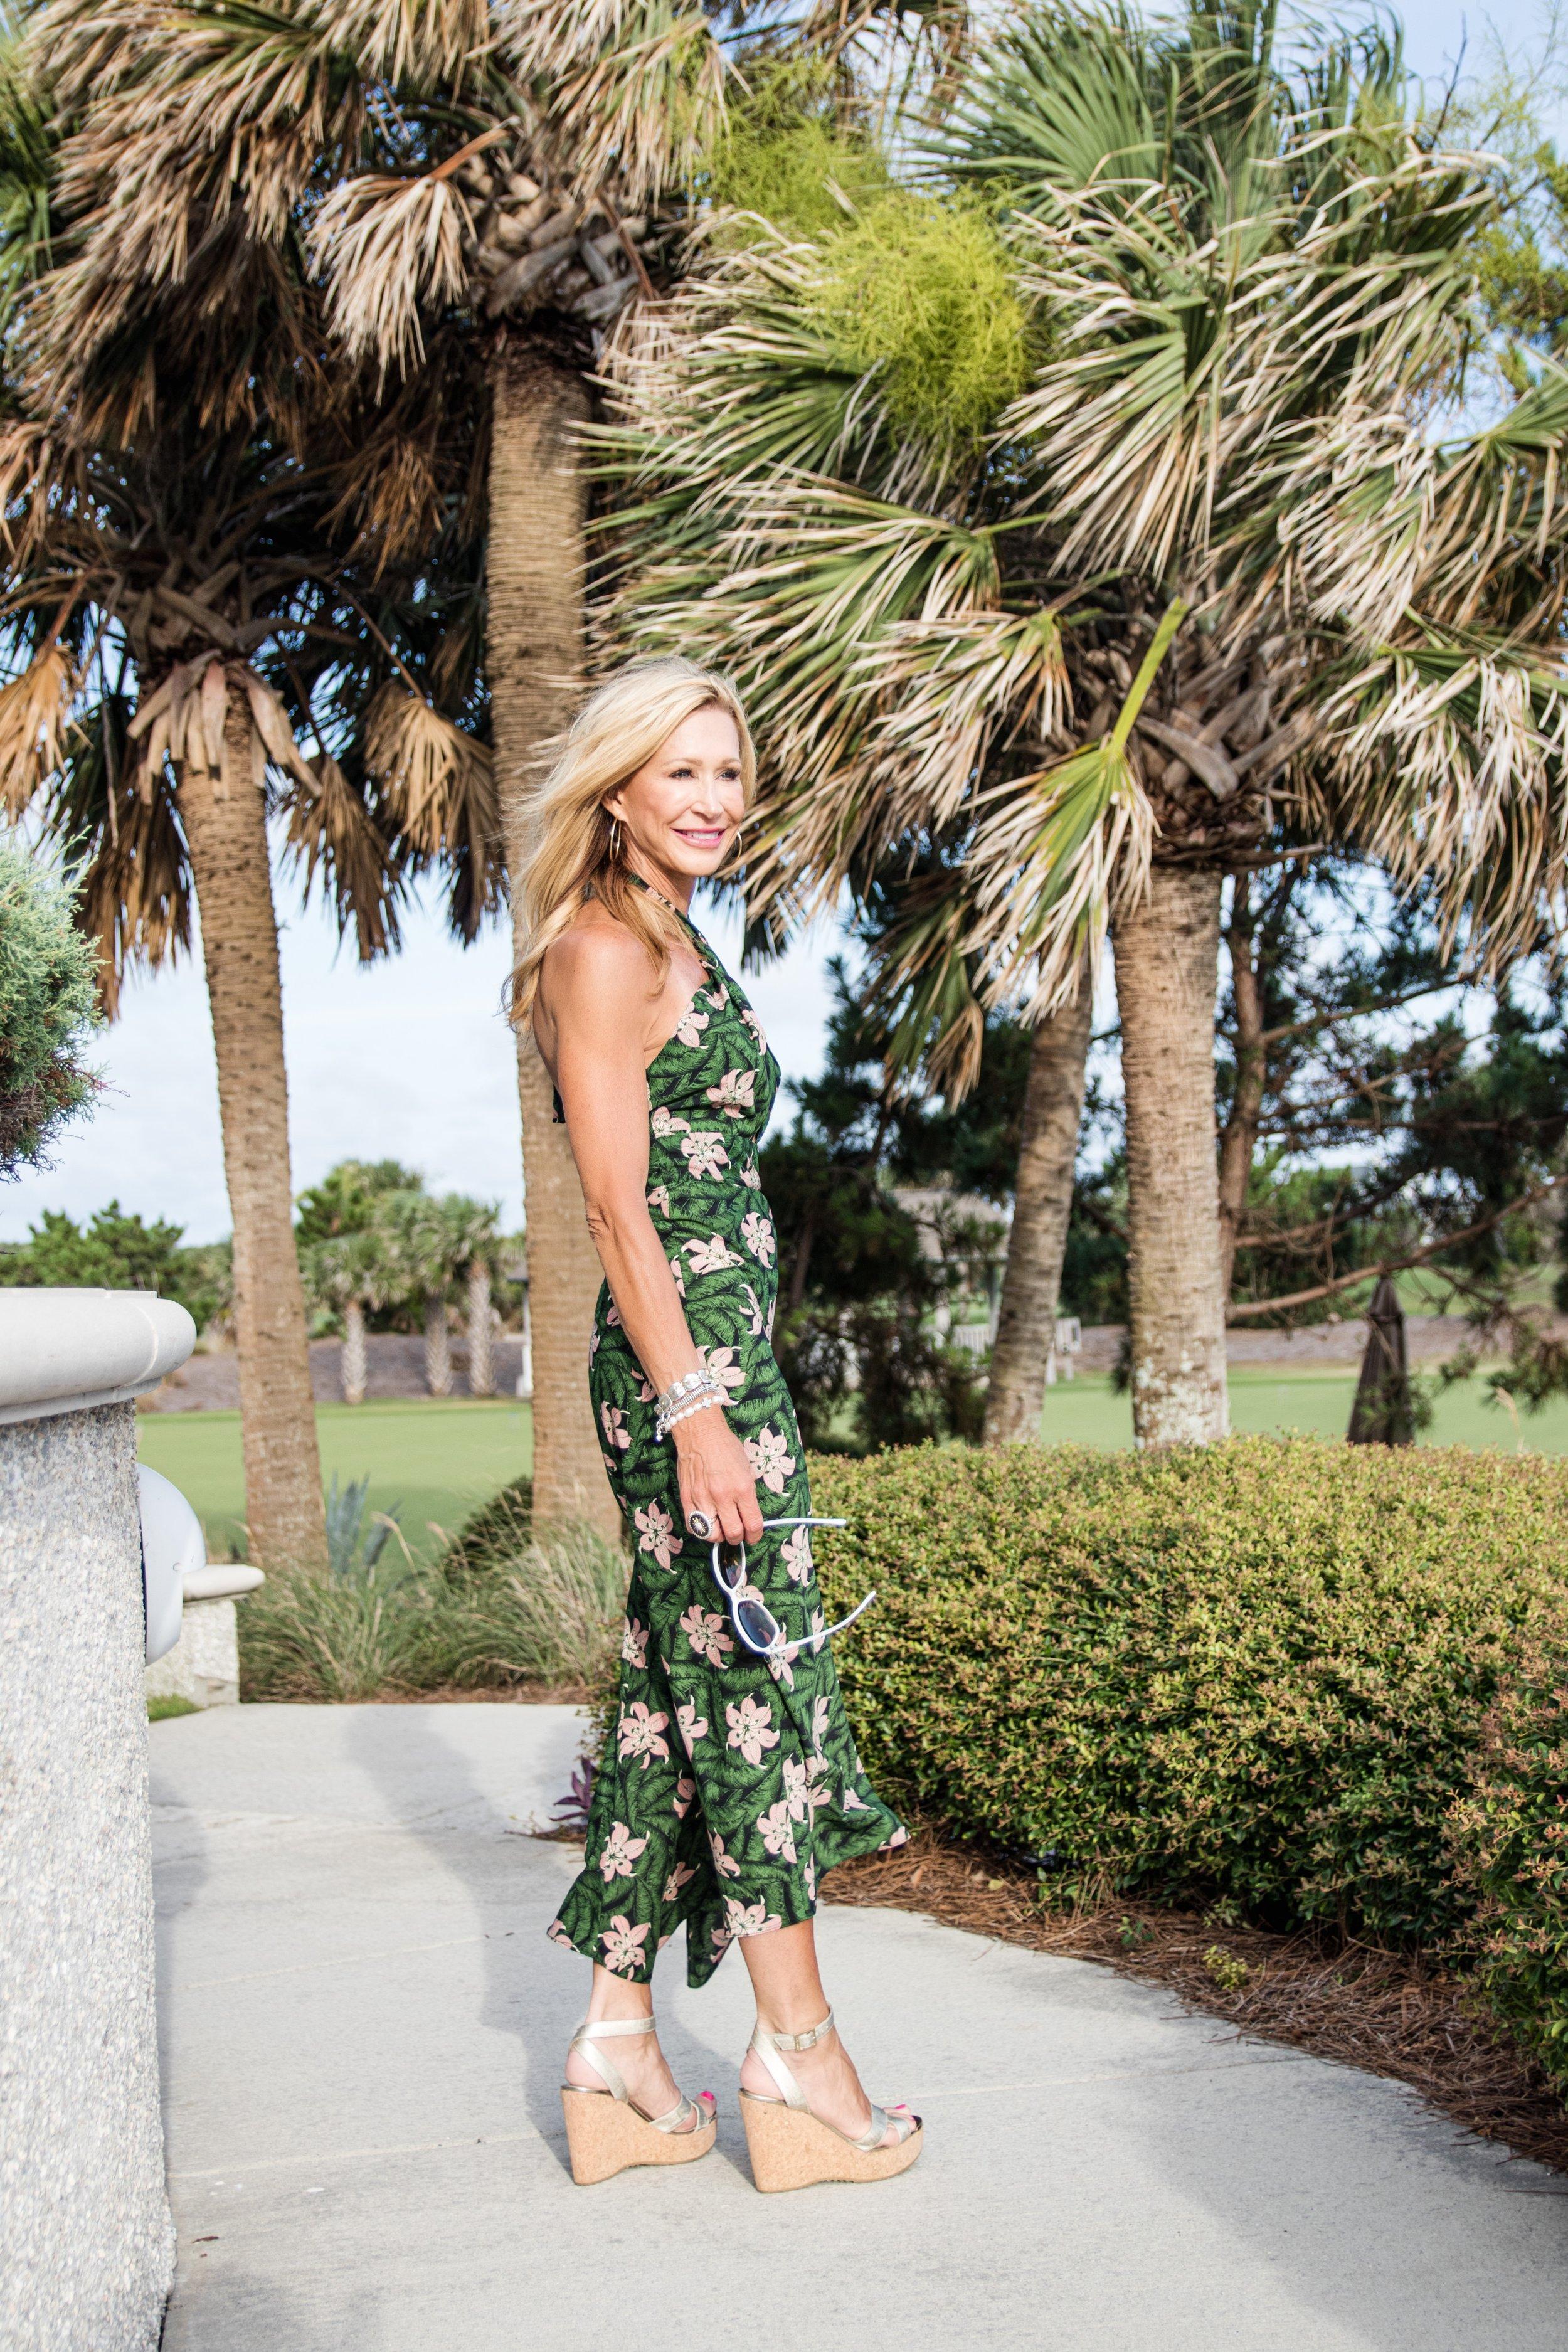 Perfect beach dress - Crazy Blonde Life